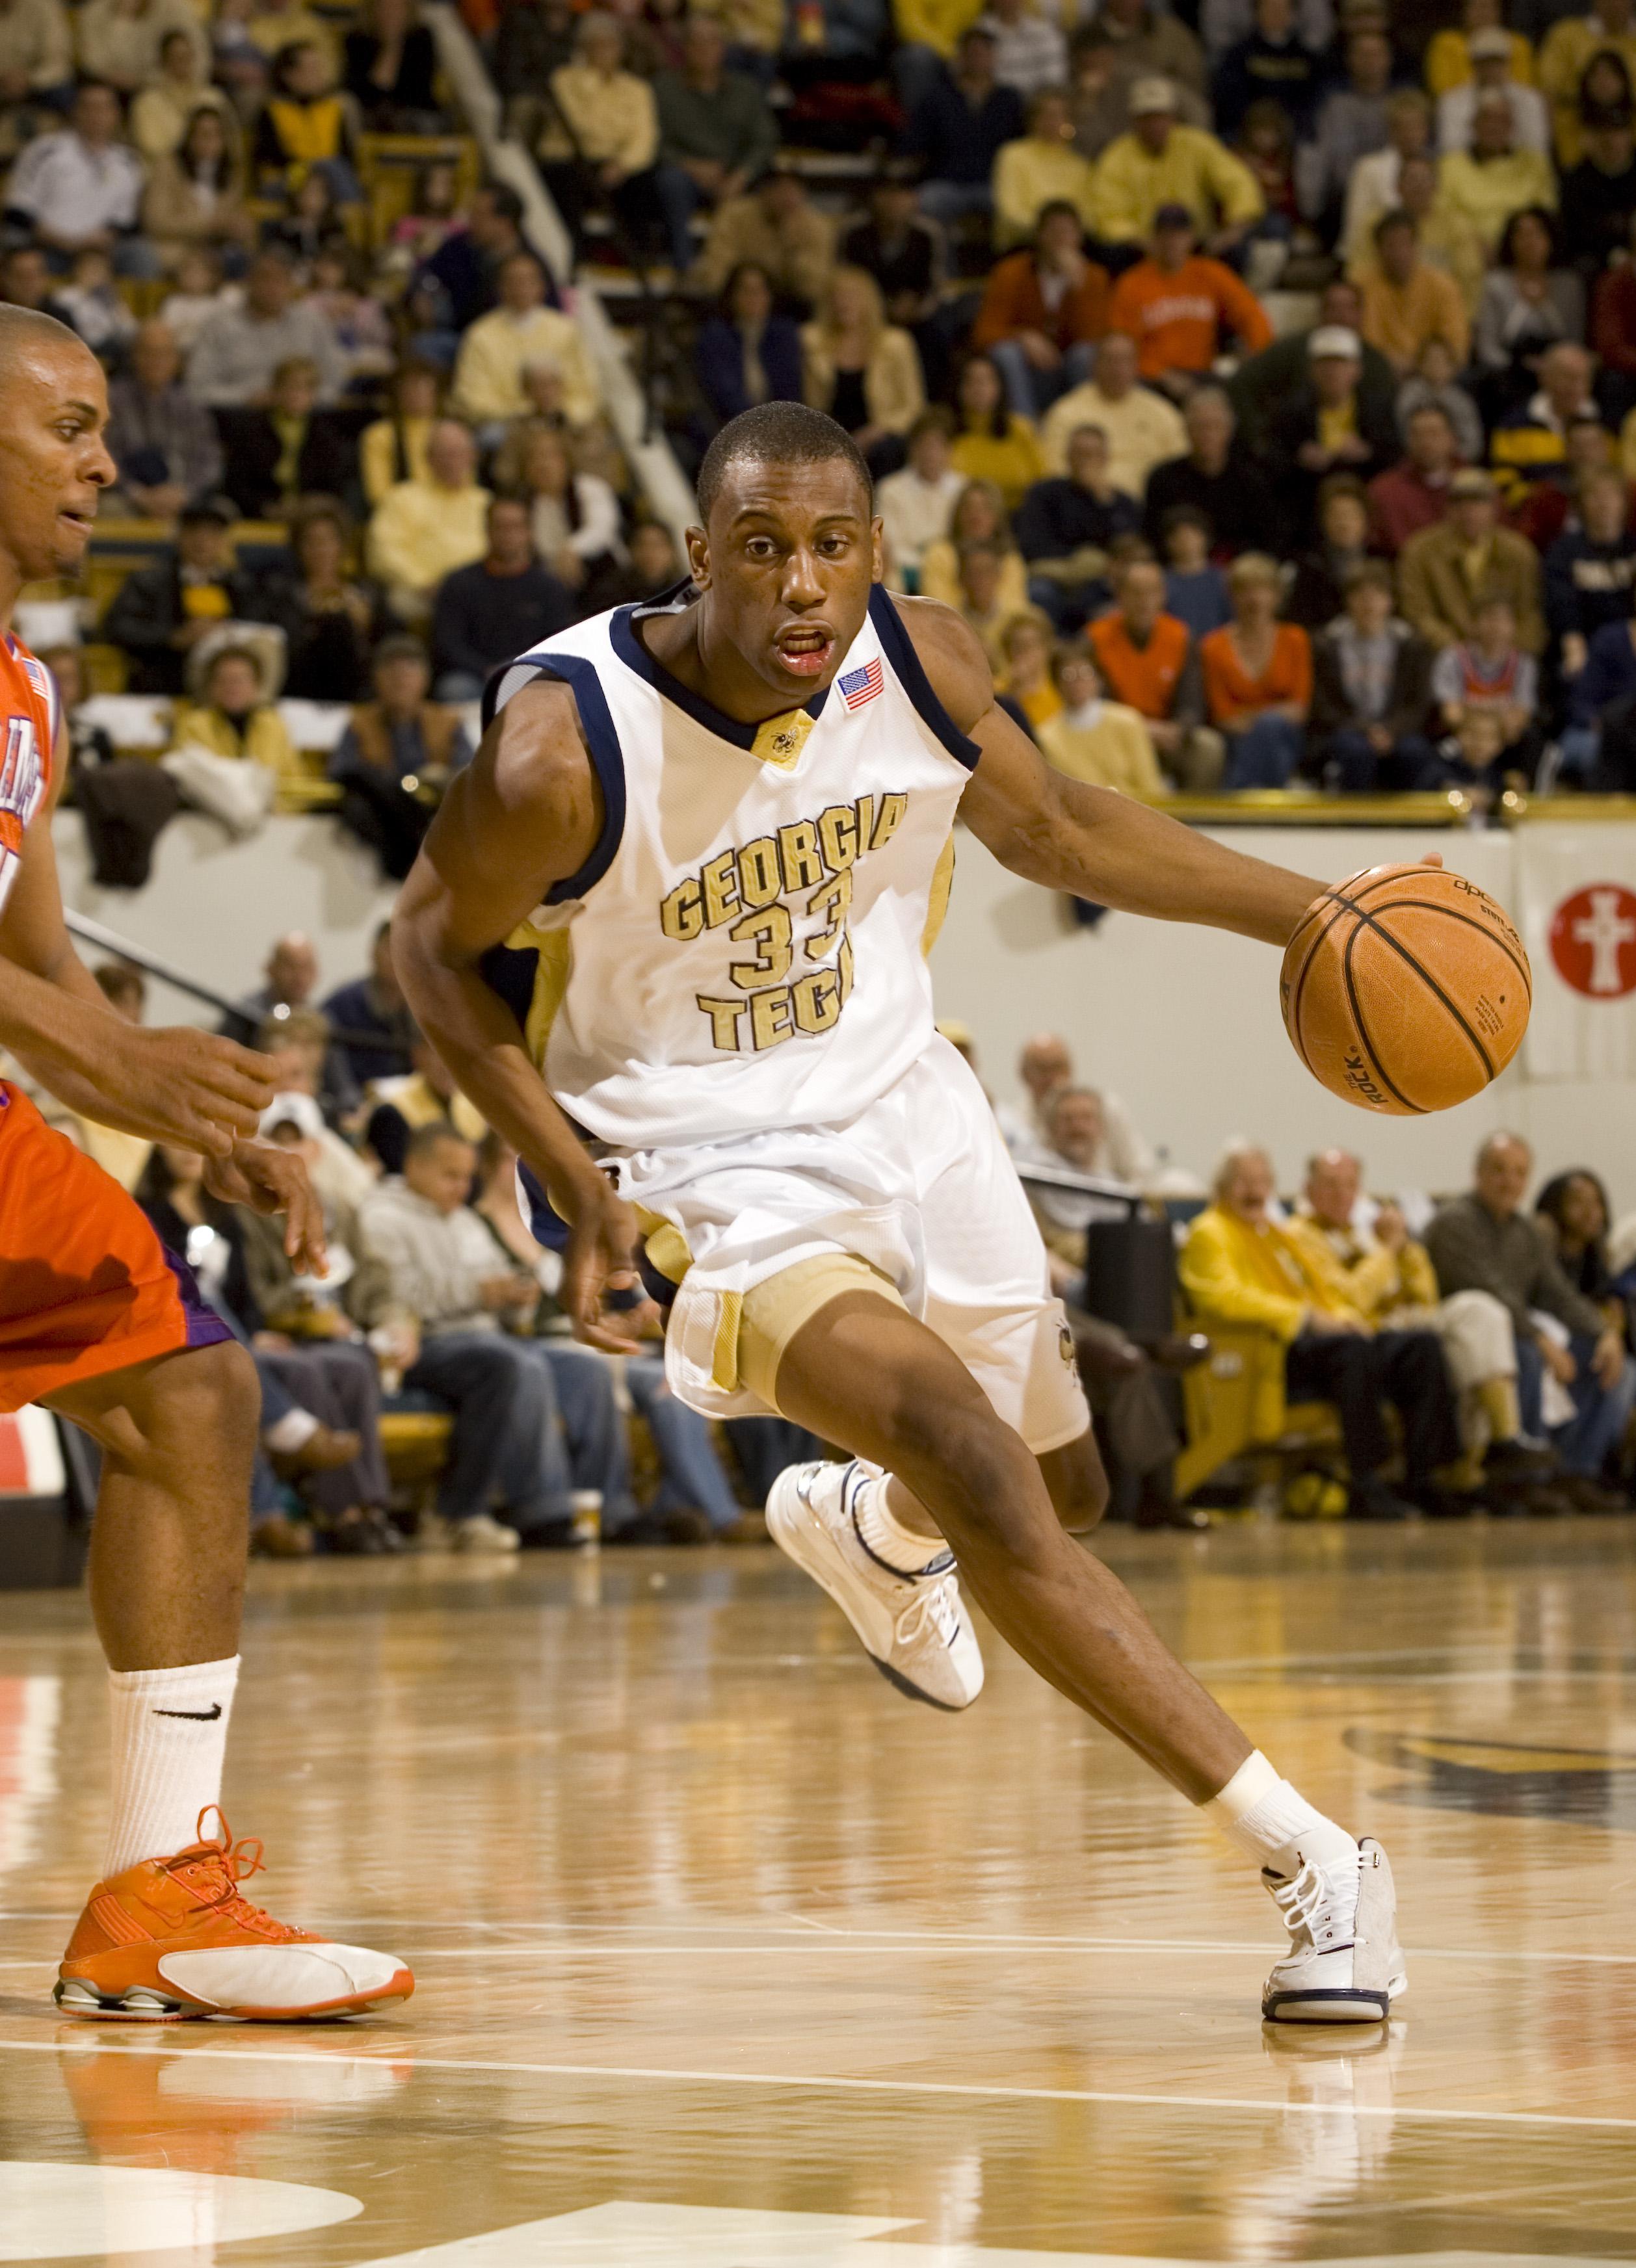 Clemson Tigers v Georgia Tech Yellow Jackets